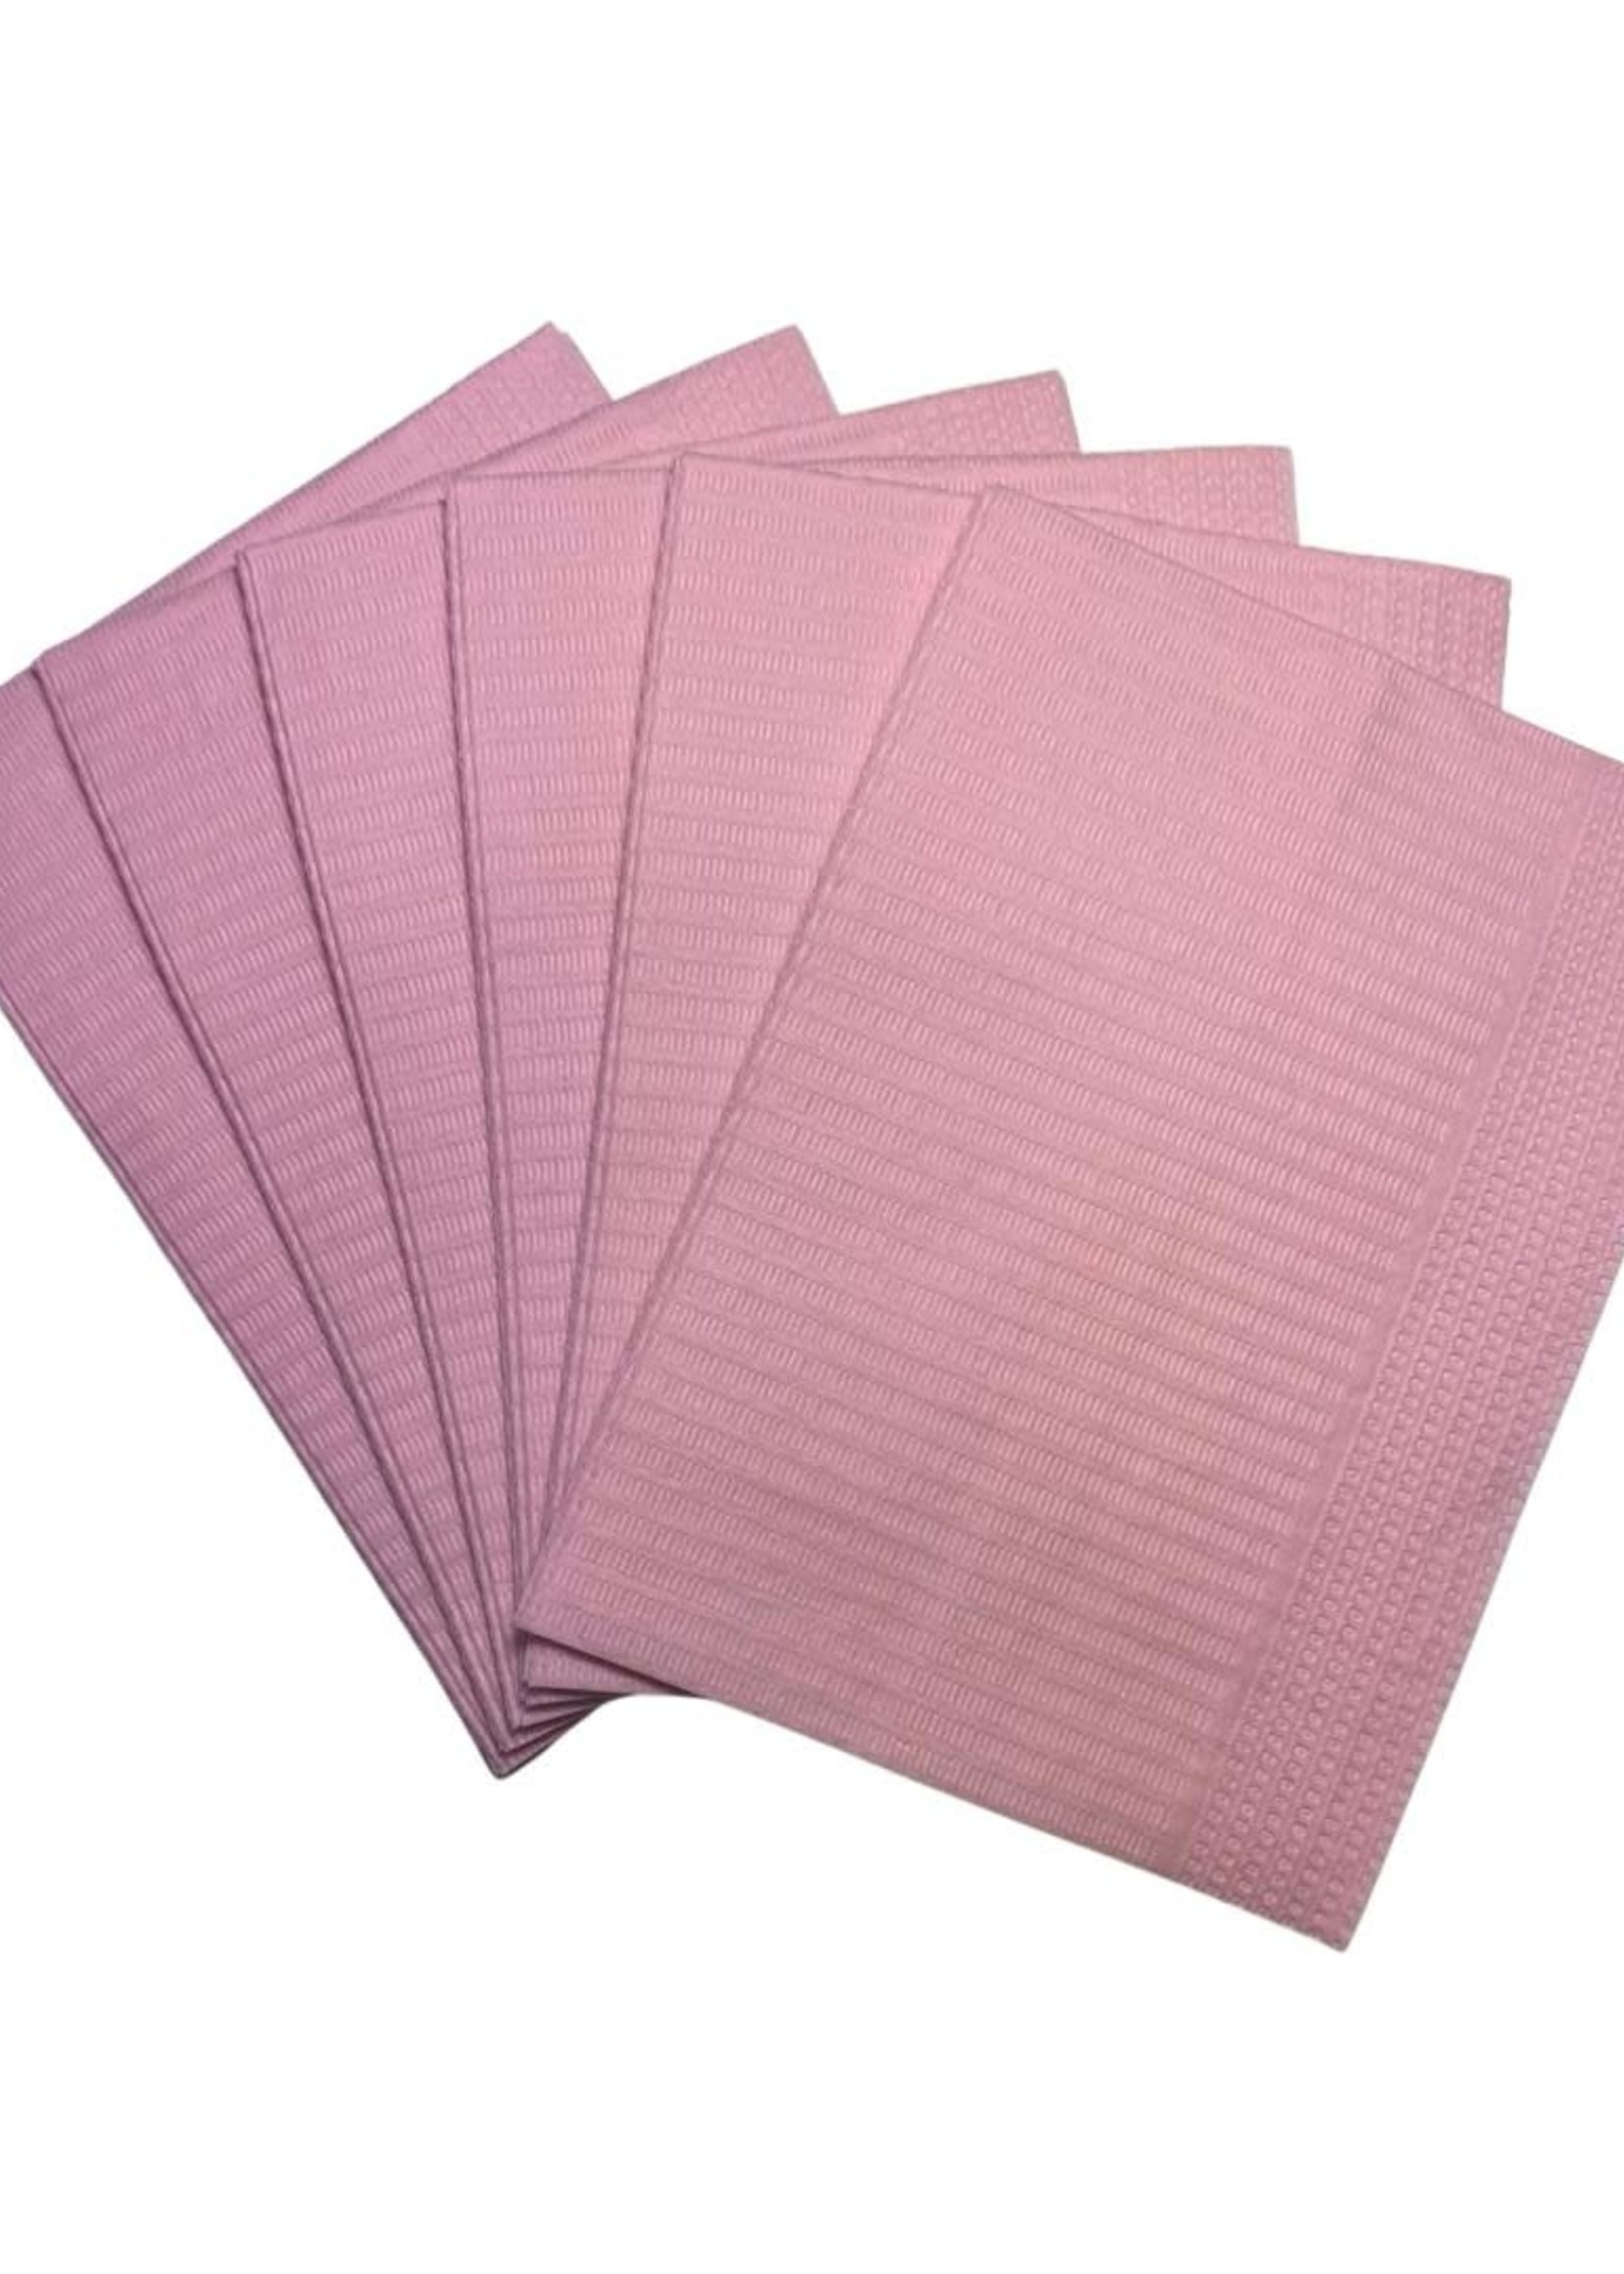 La Ross Table Towels Roze